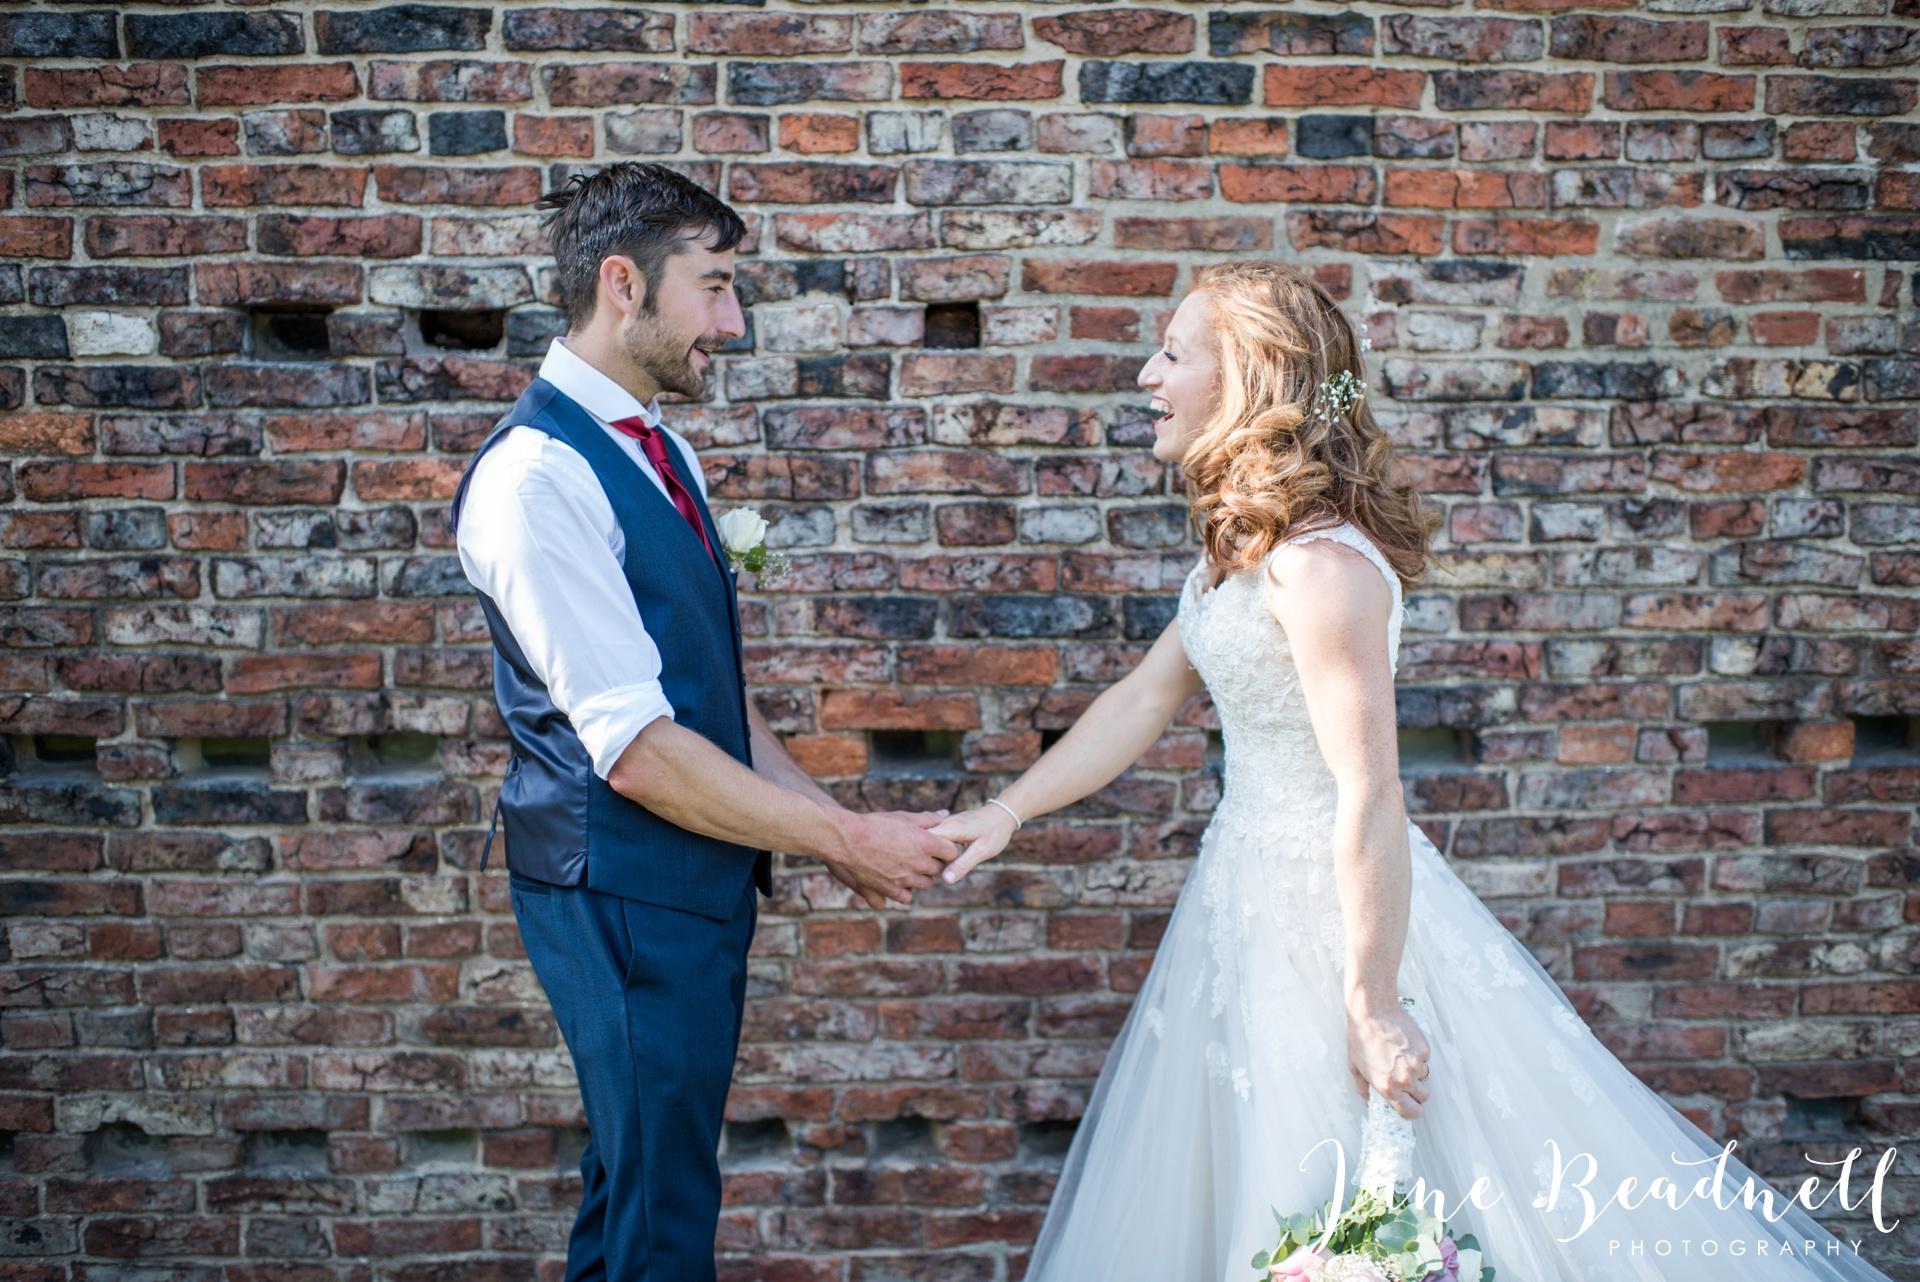 yorkshire-fine-art-wedding-photographer-jane-beadnell-photography-poppleton-york_0109